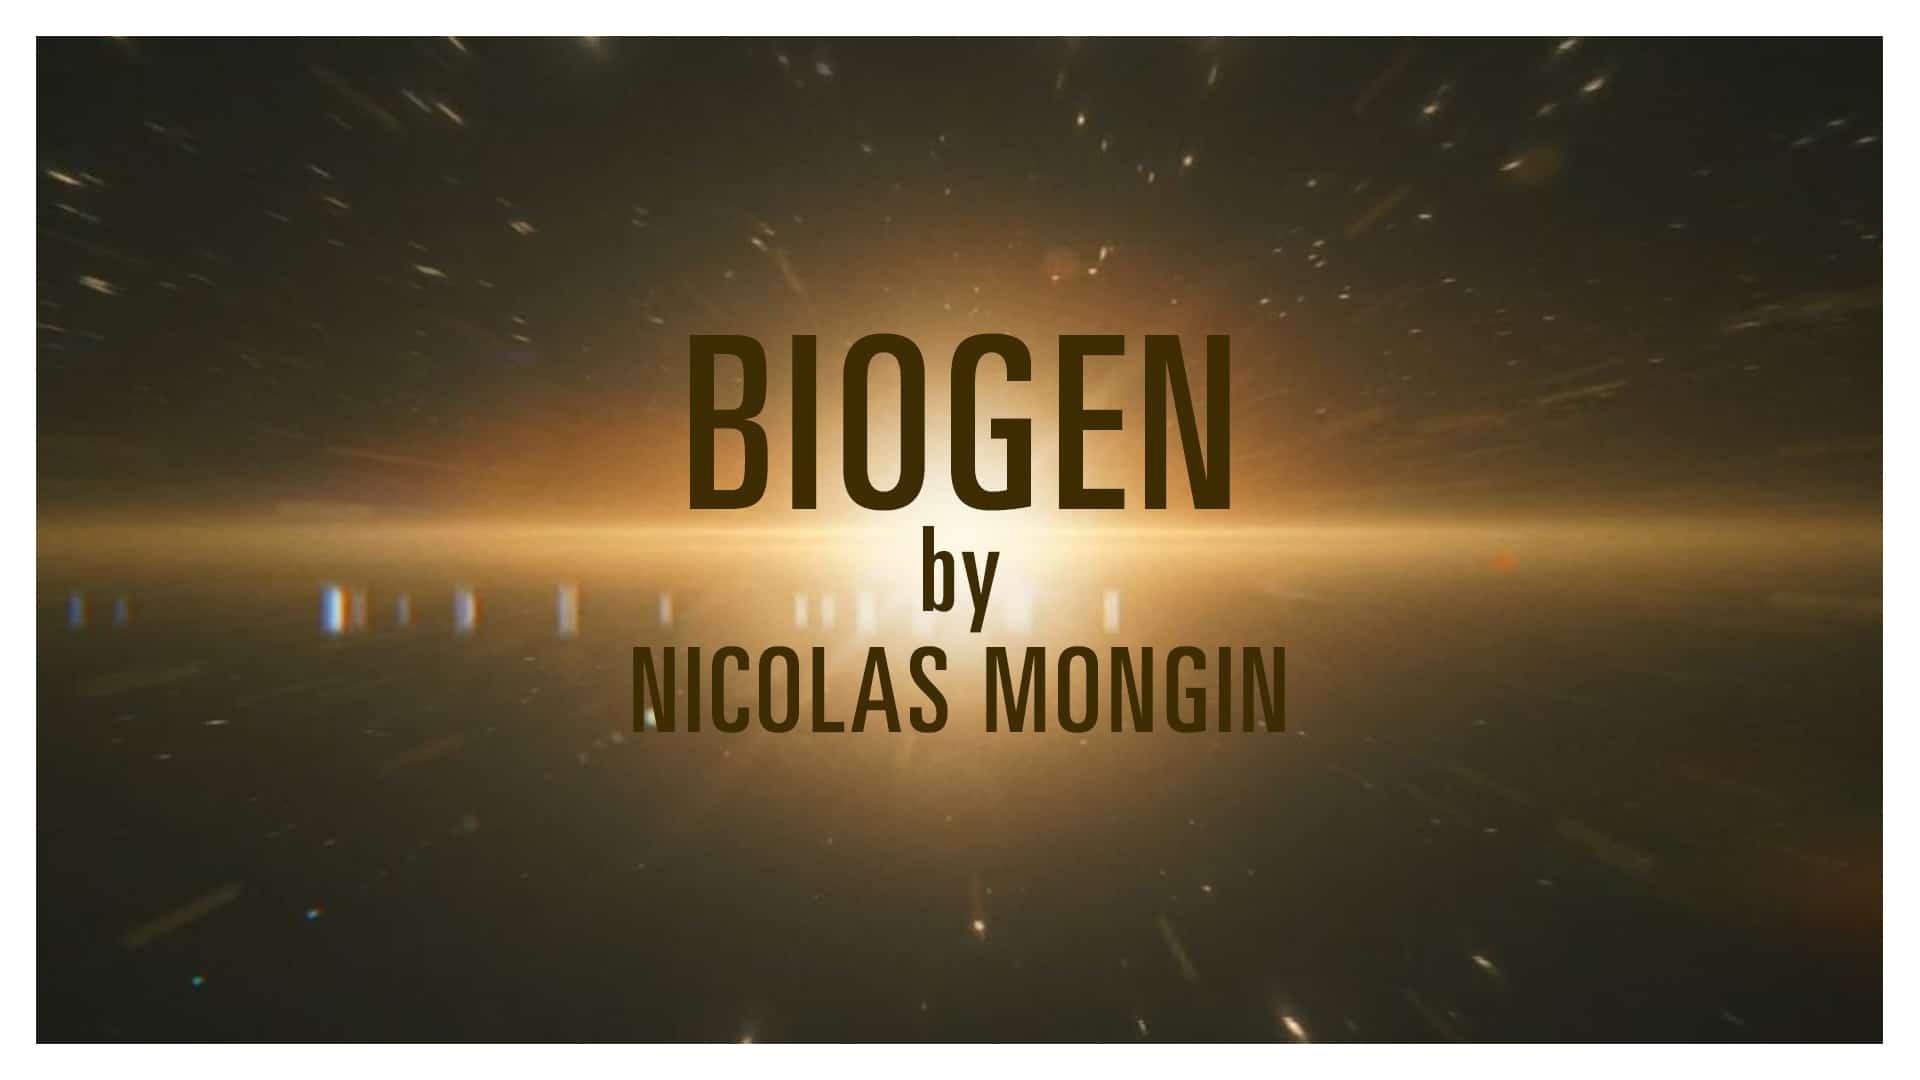 BIOGEN – The journey